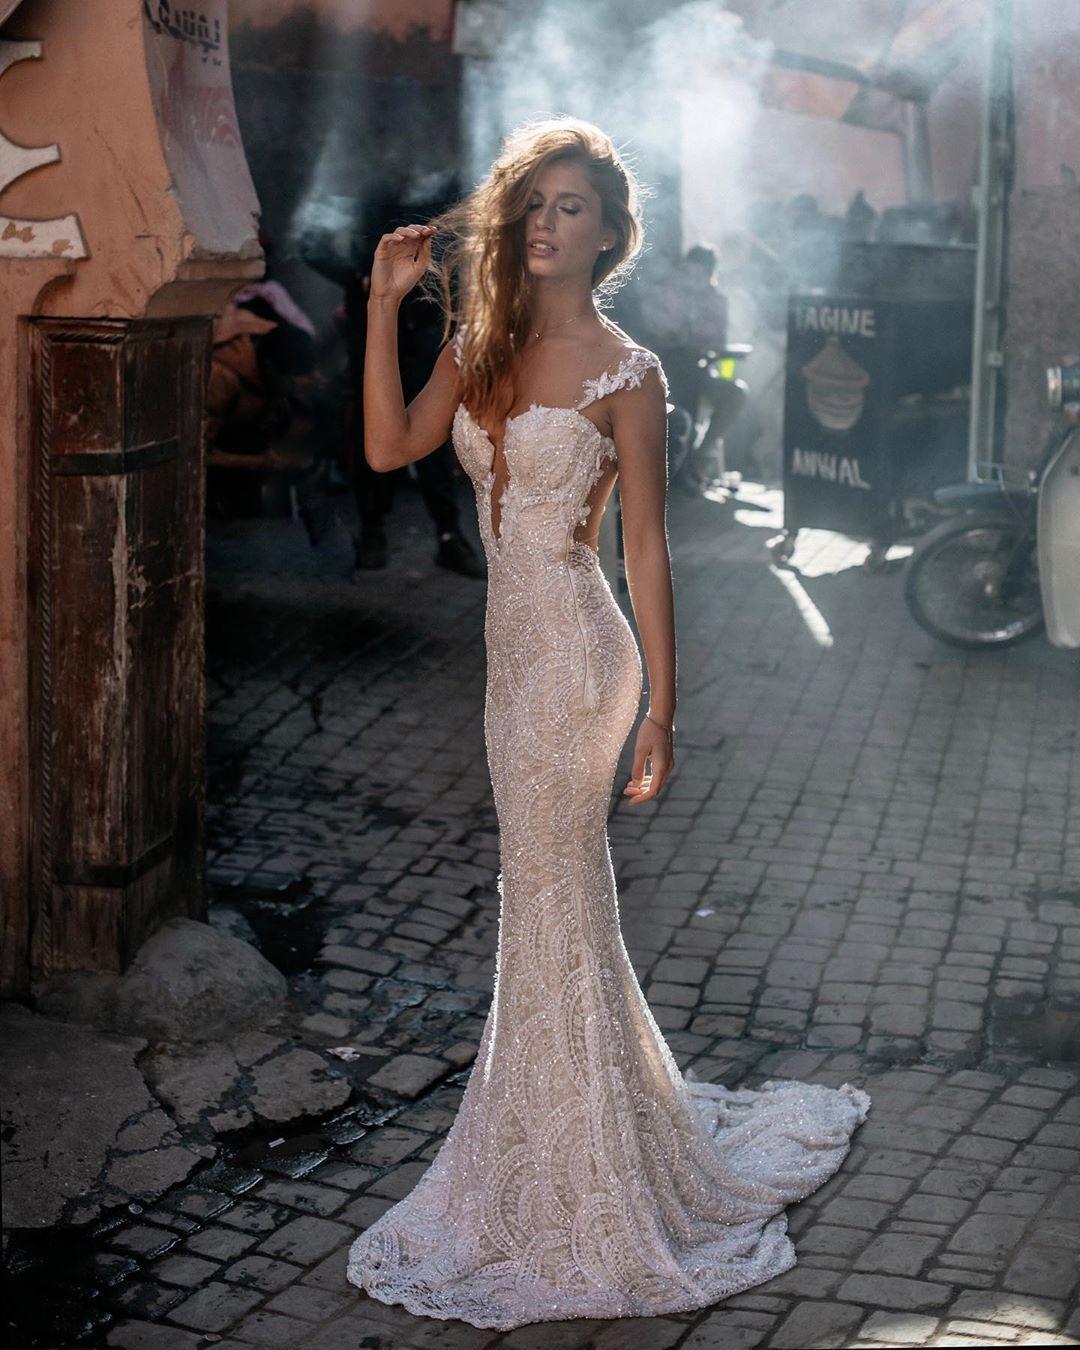 Galia Lahav On Instagram Just Me Myself And My Gown The Harlow Is Always A Favorite Glcouture Wedding Dresses Rental Wedding Dresses Wedding Gown Rental